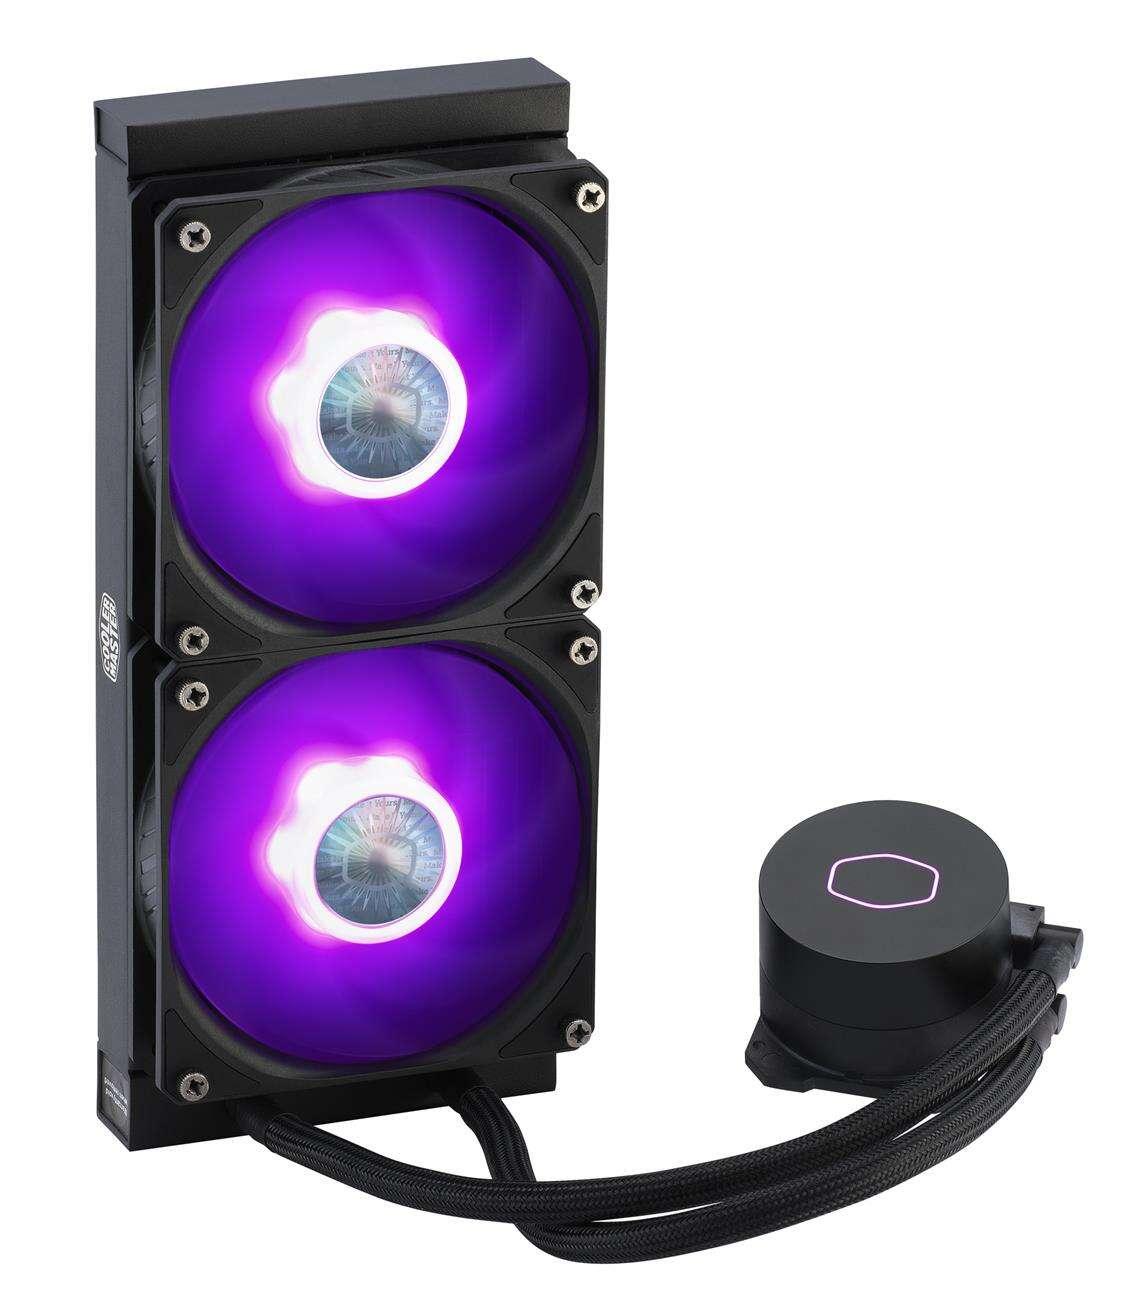 specyfikacja Cooler Master MasterLiquid ML240L V2 RGB